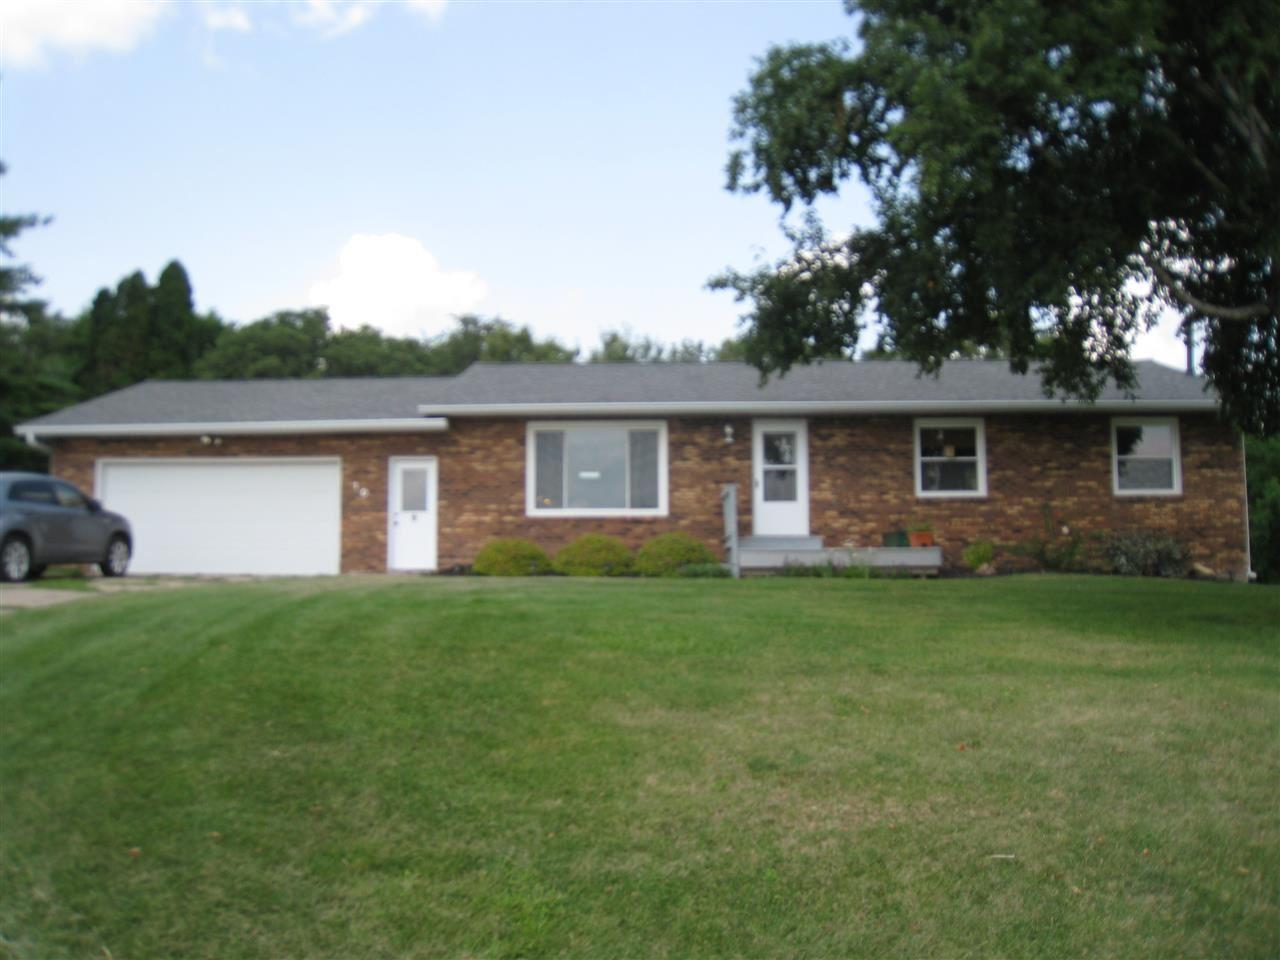 Real Estate for Sale, ListingId: 29297165, Orion,IL61273